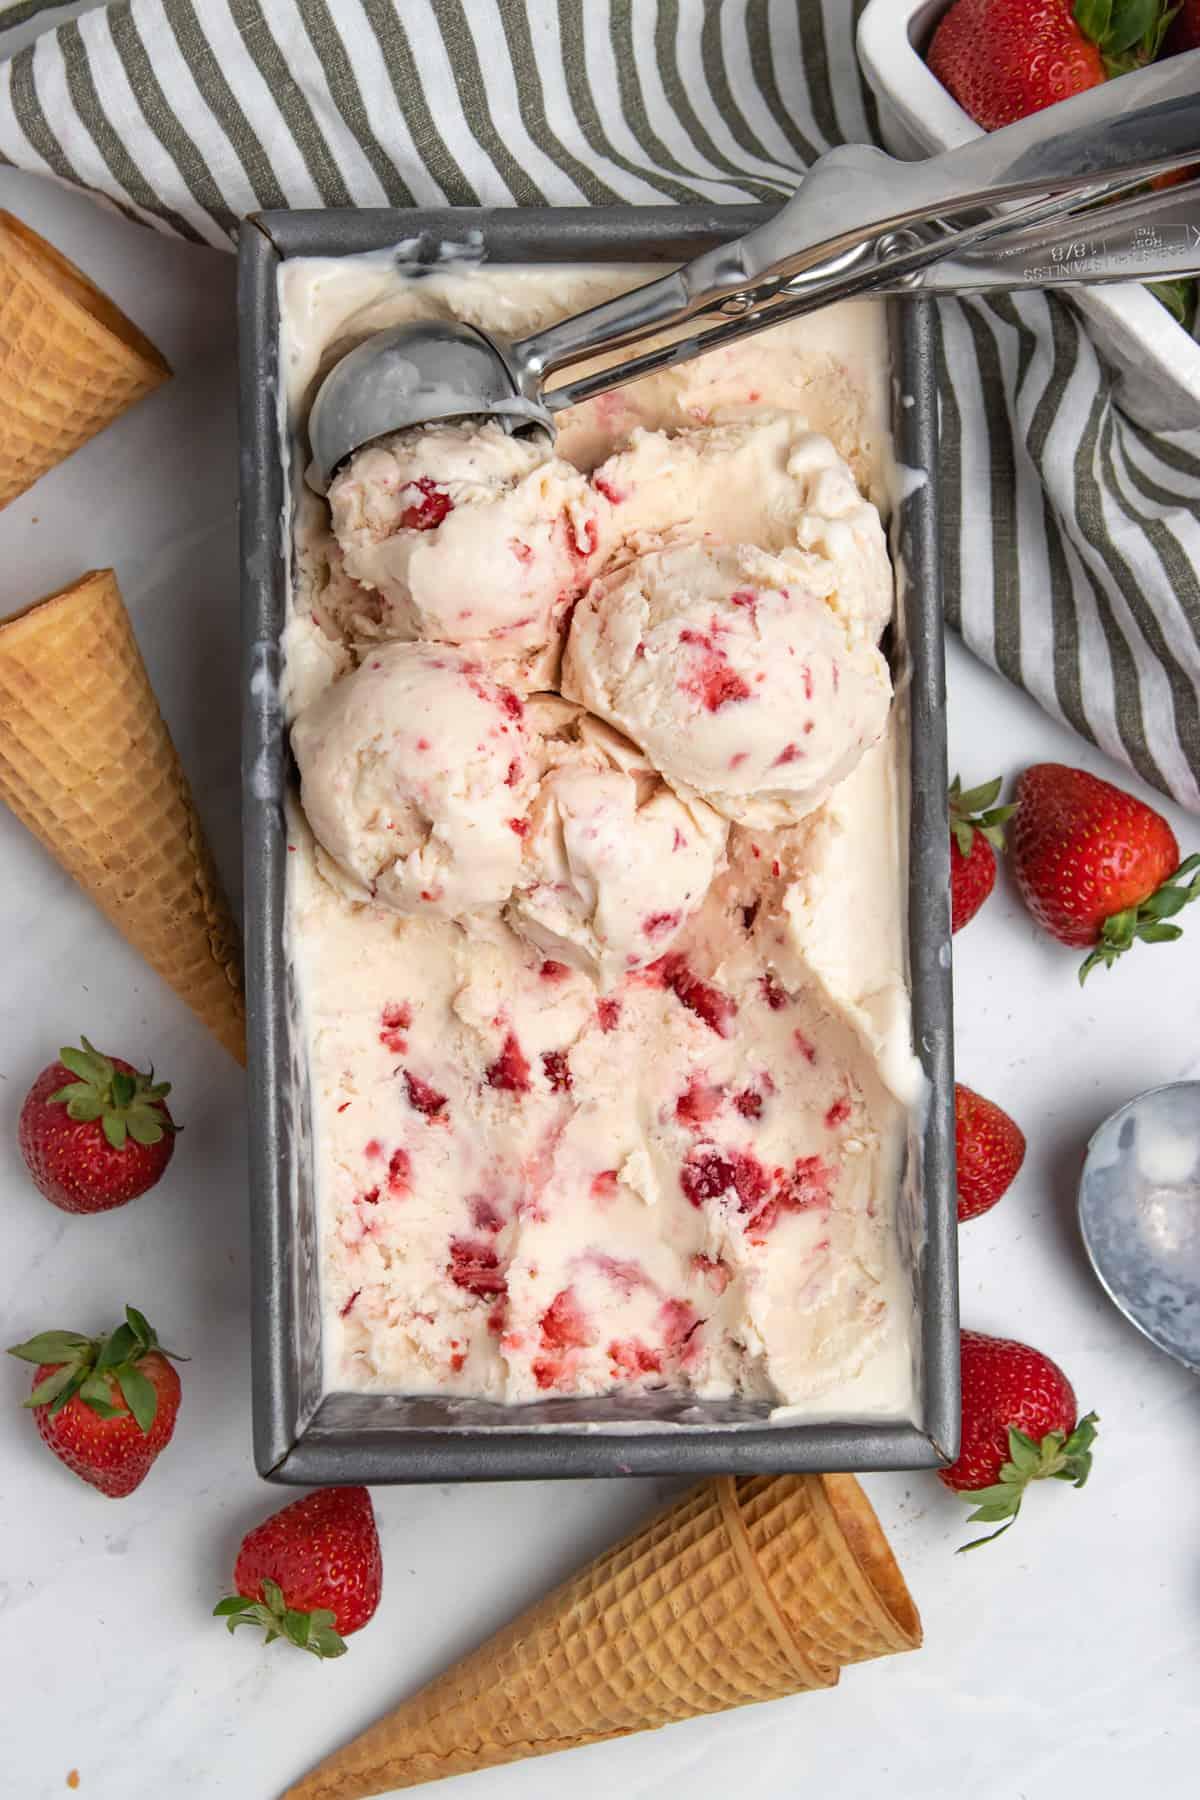 Strawberry ice cream in bread pan with ice cream scoop.